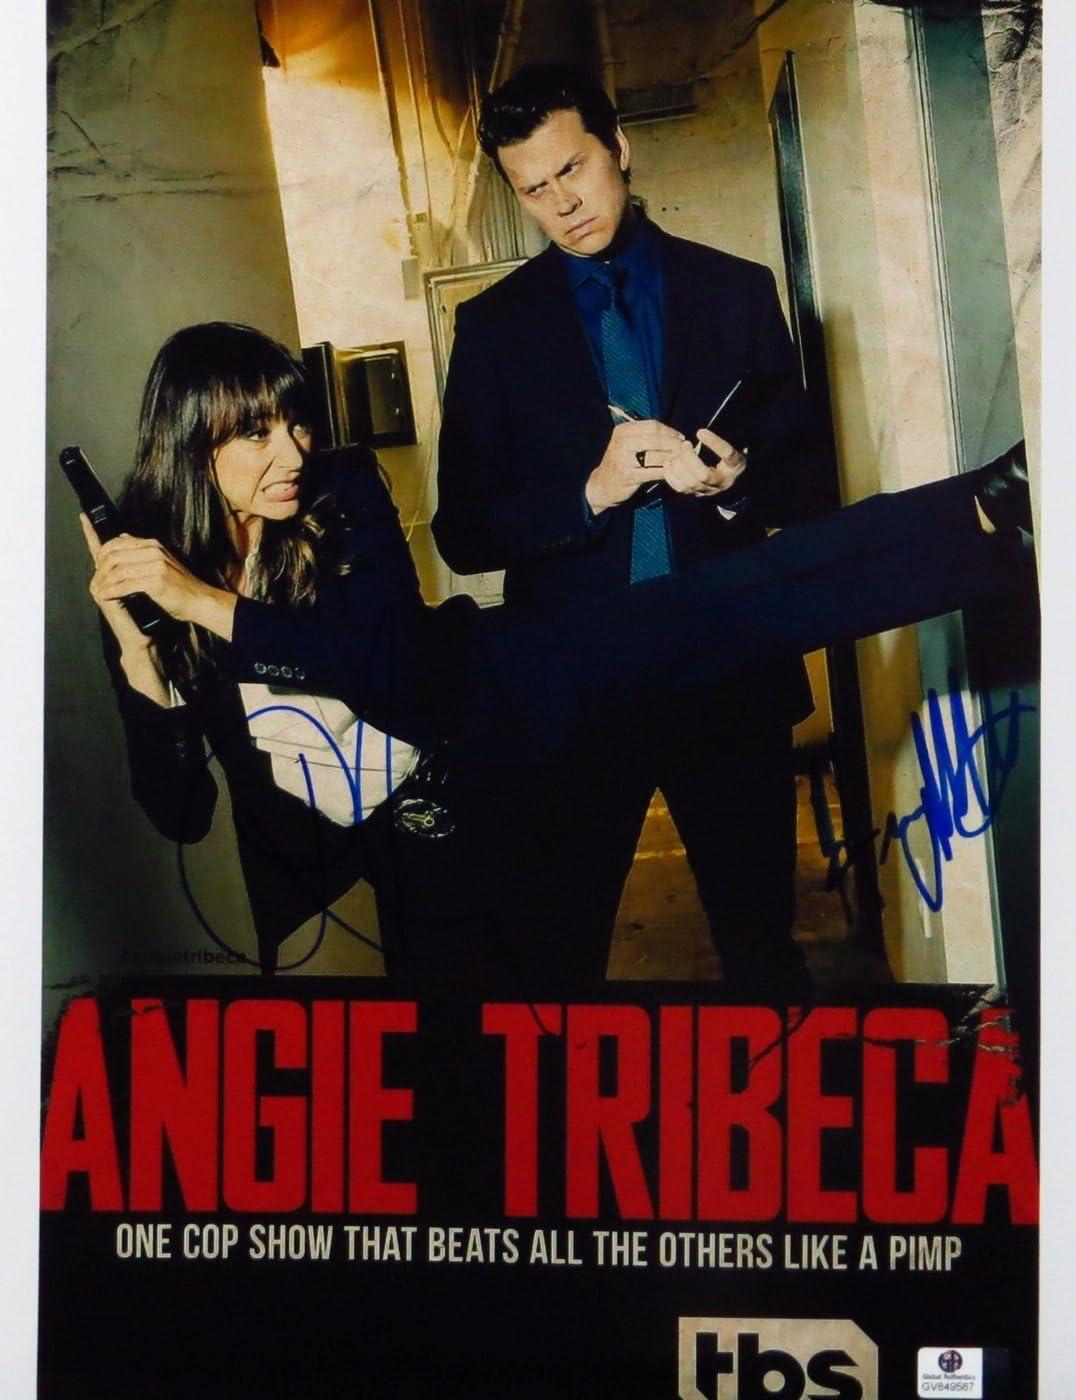 Hayes MacArthur Rashida Jones Autographed Photo Outlet sale feature Trib Ranking TOP7 Angie 11X14